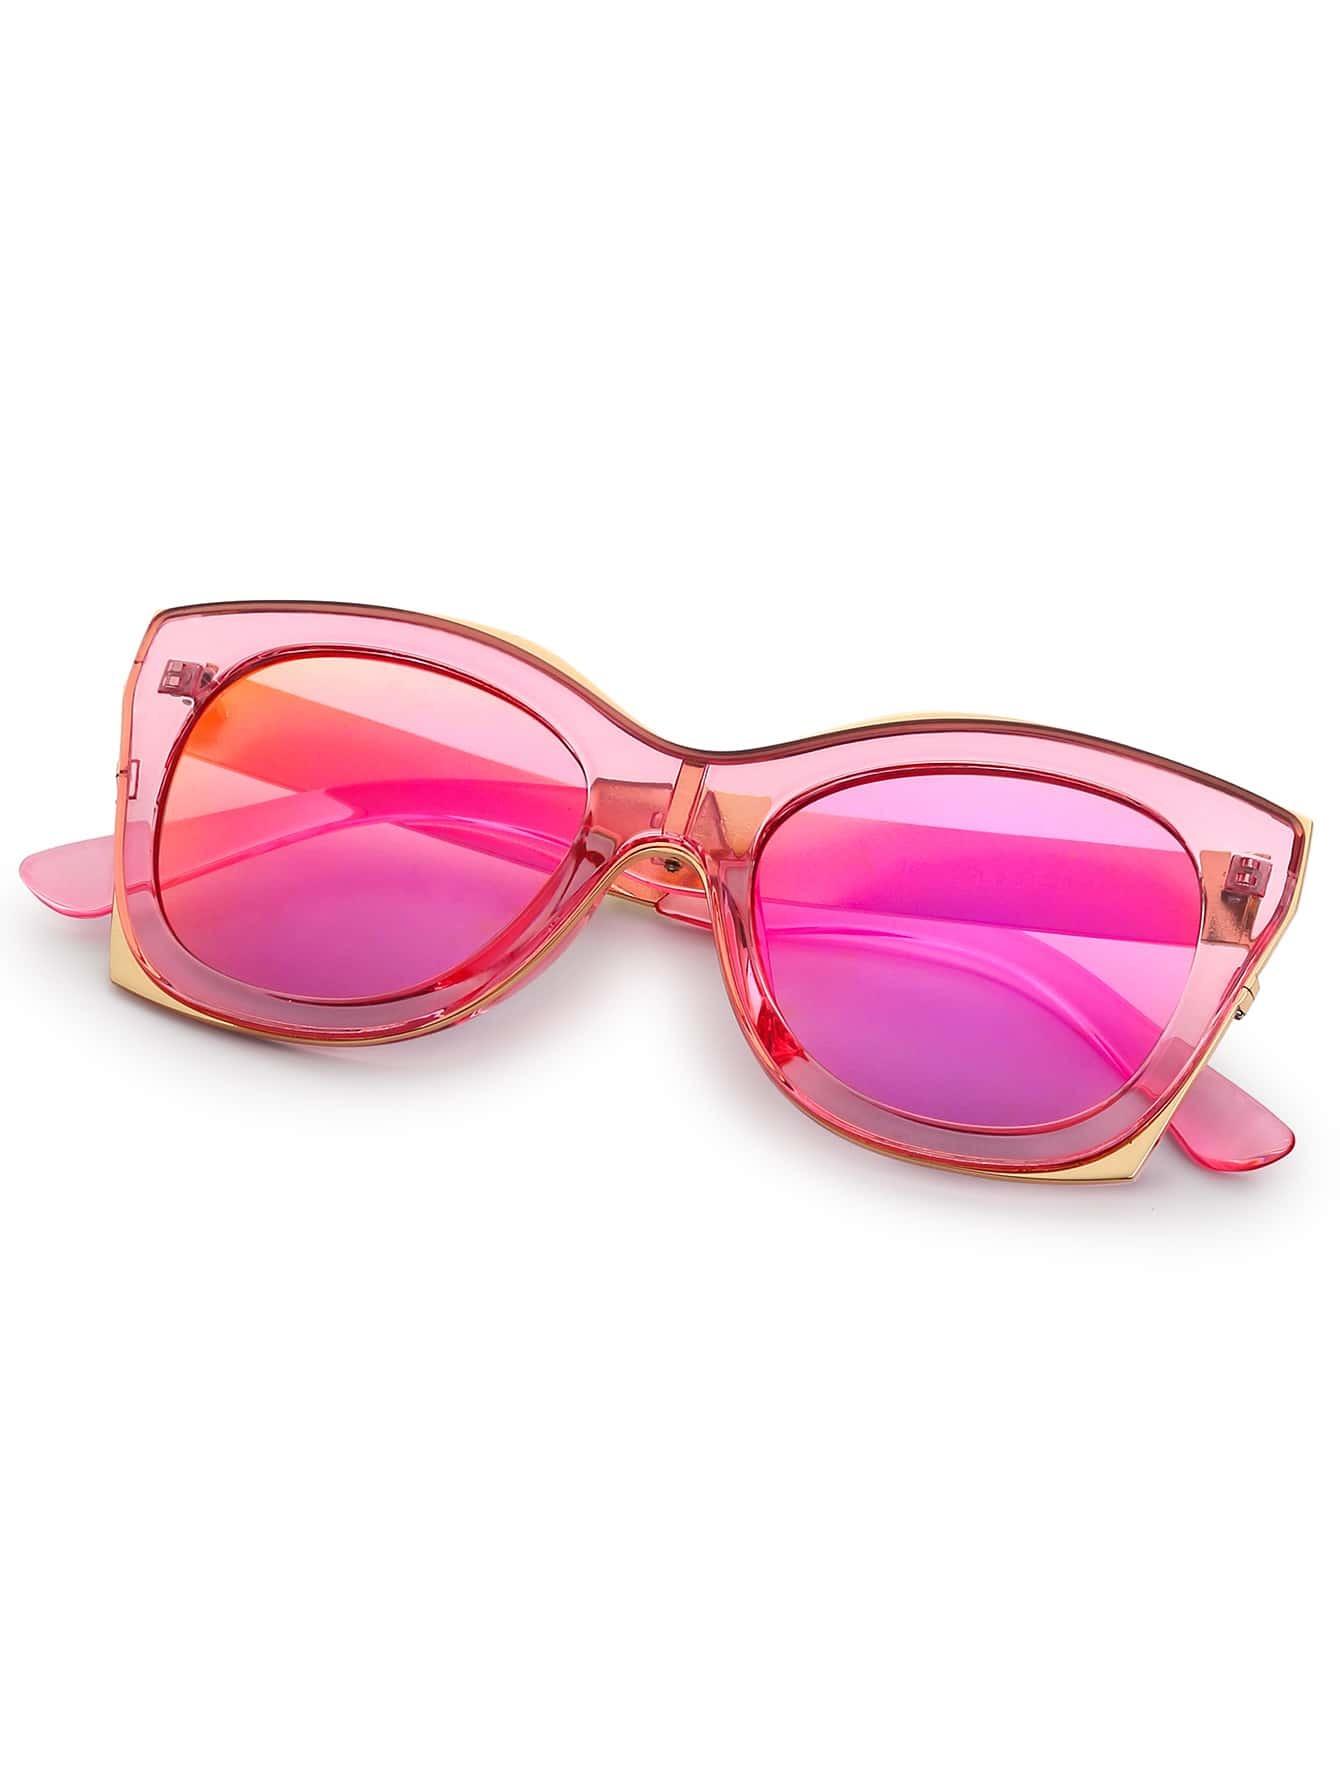 sunglasses160806305_2